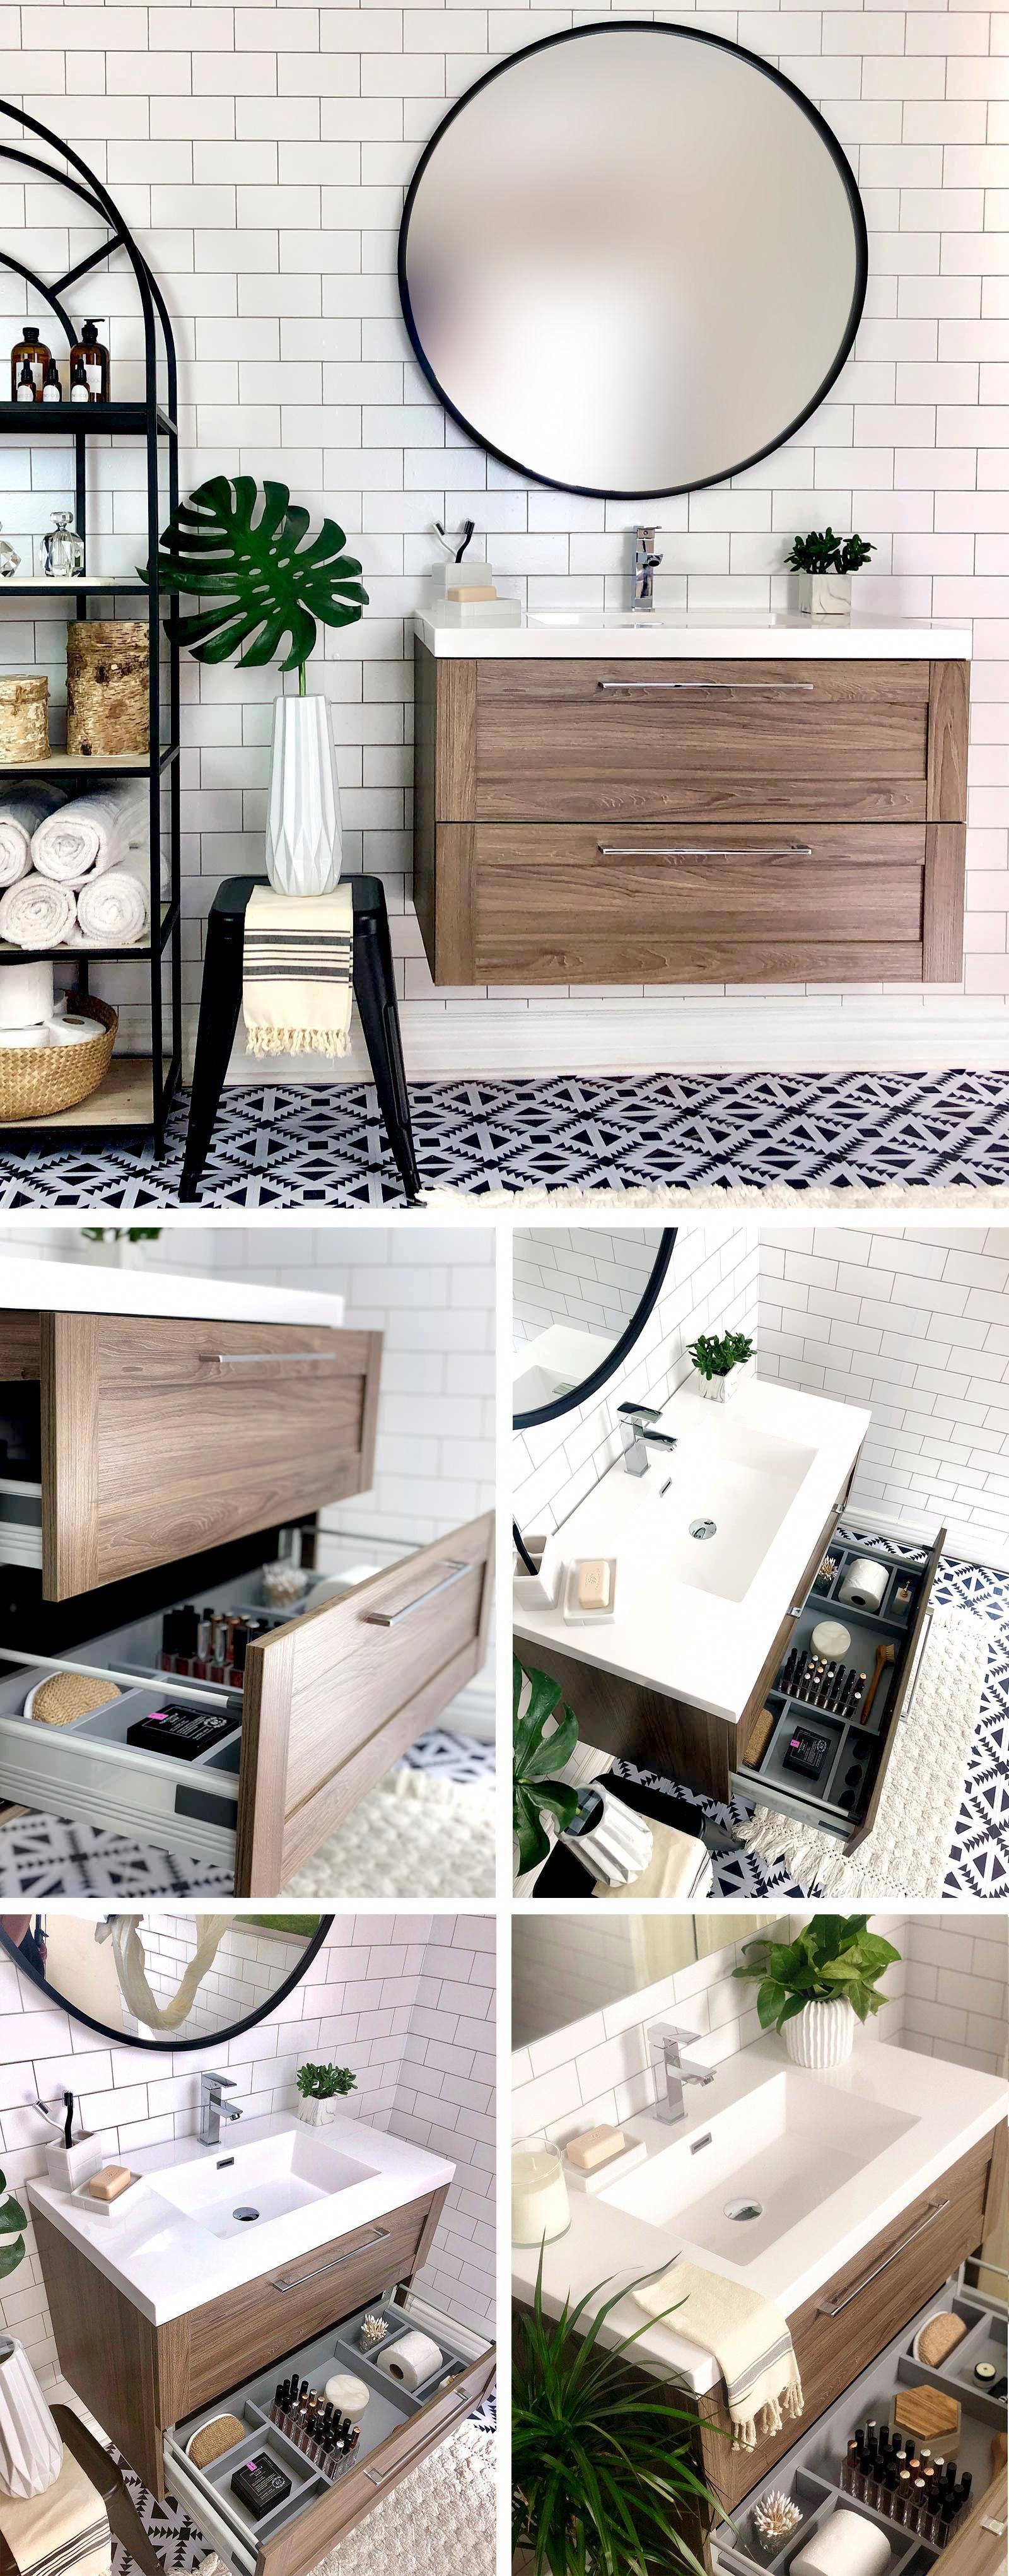 Modern bathroom vanity by flairwood decor bathroomideas